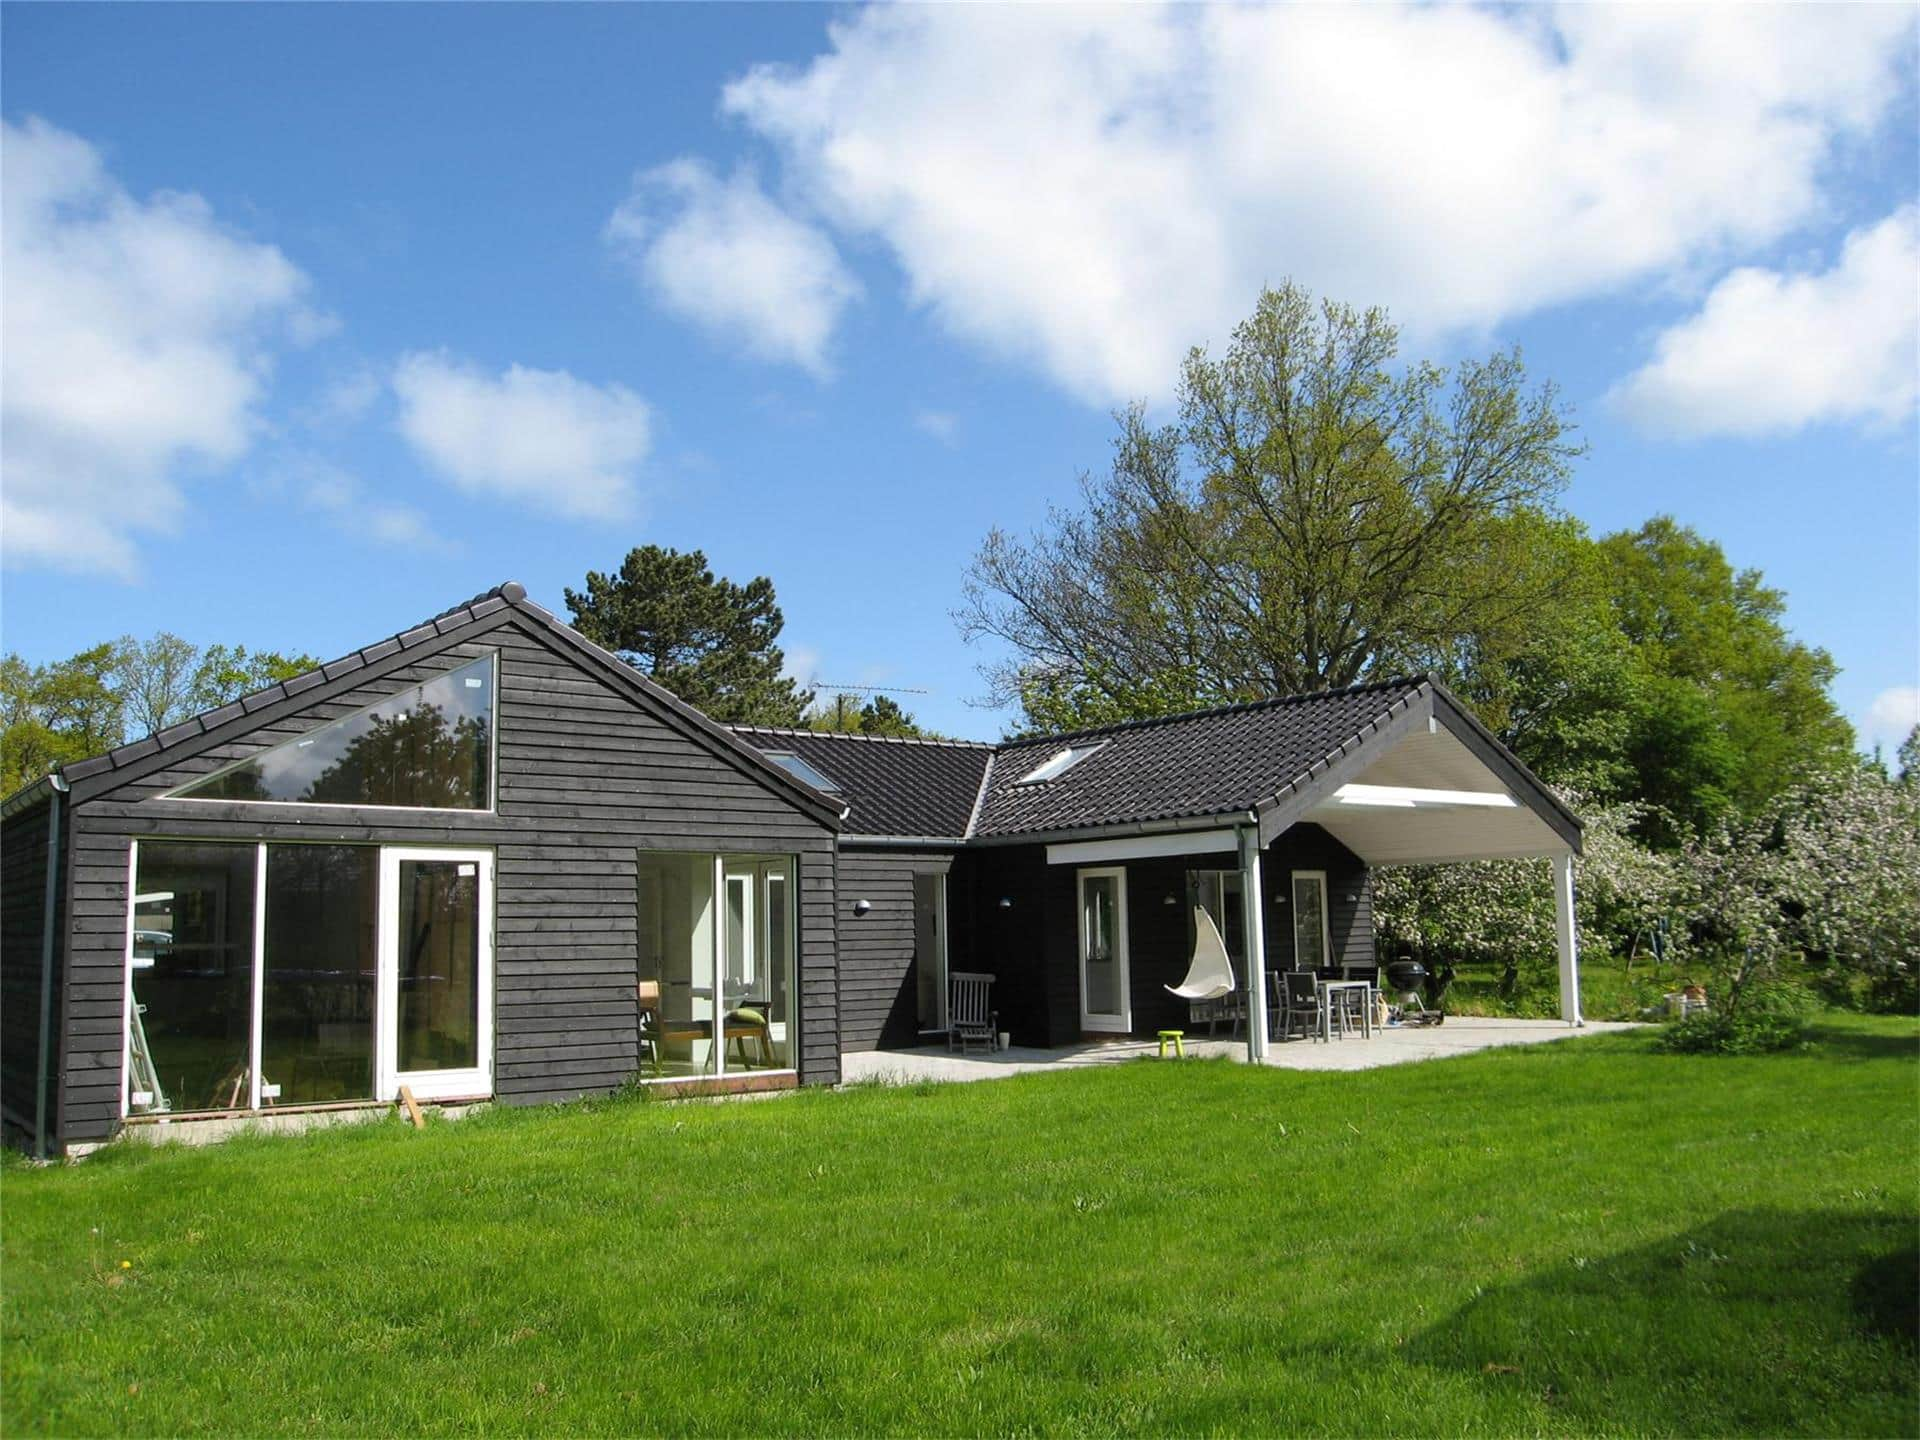 Bild 1-17 Ferienhaus 13303, Høve Stræde 42, DK - 4550 Asnæs